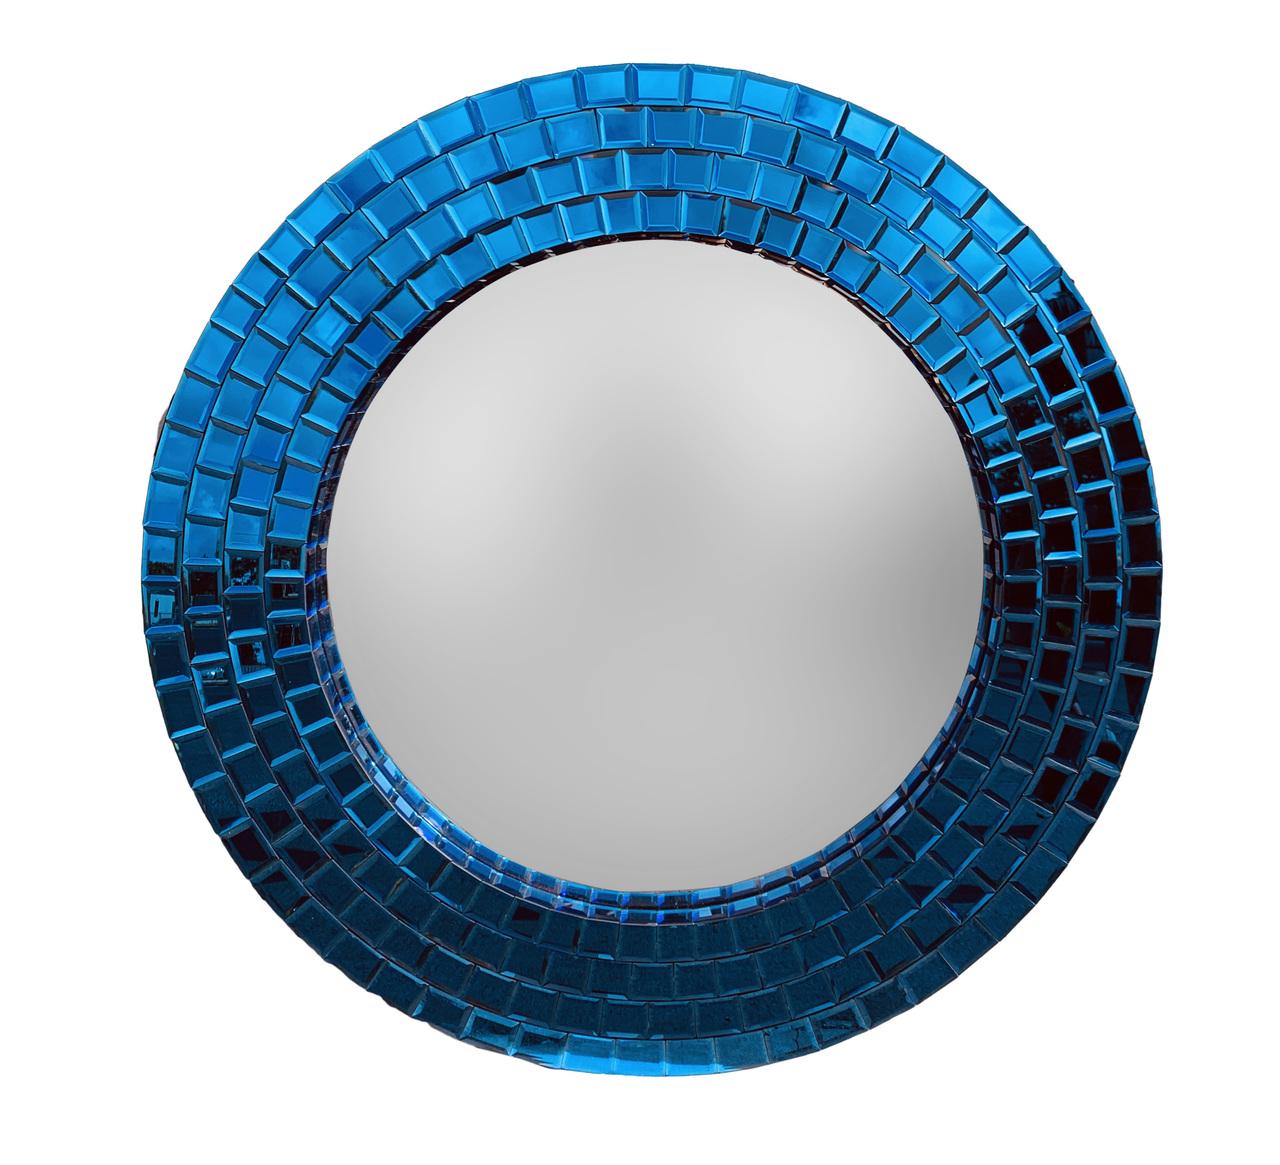 blue-mirror.jpg